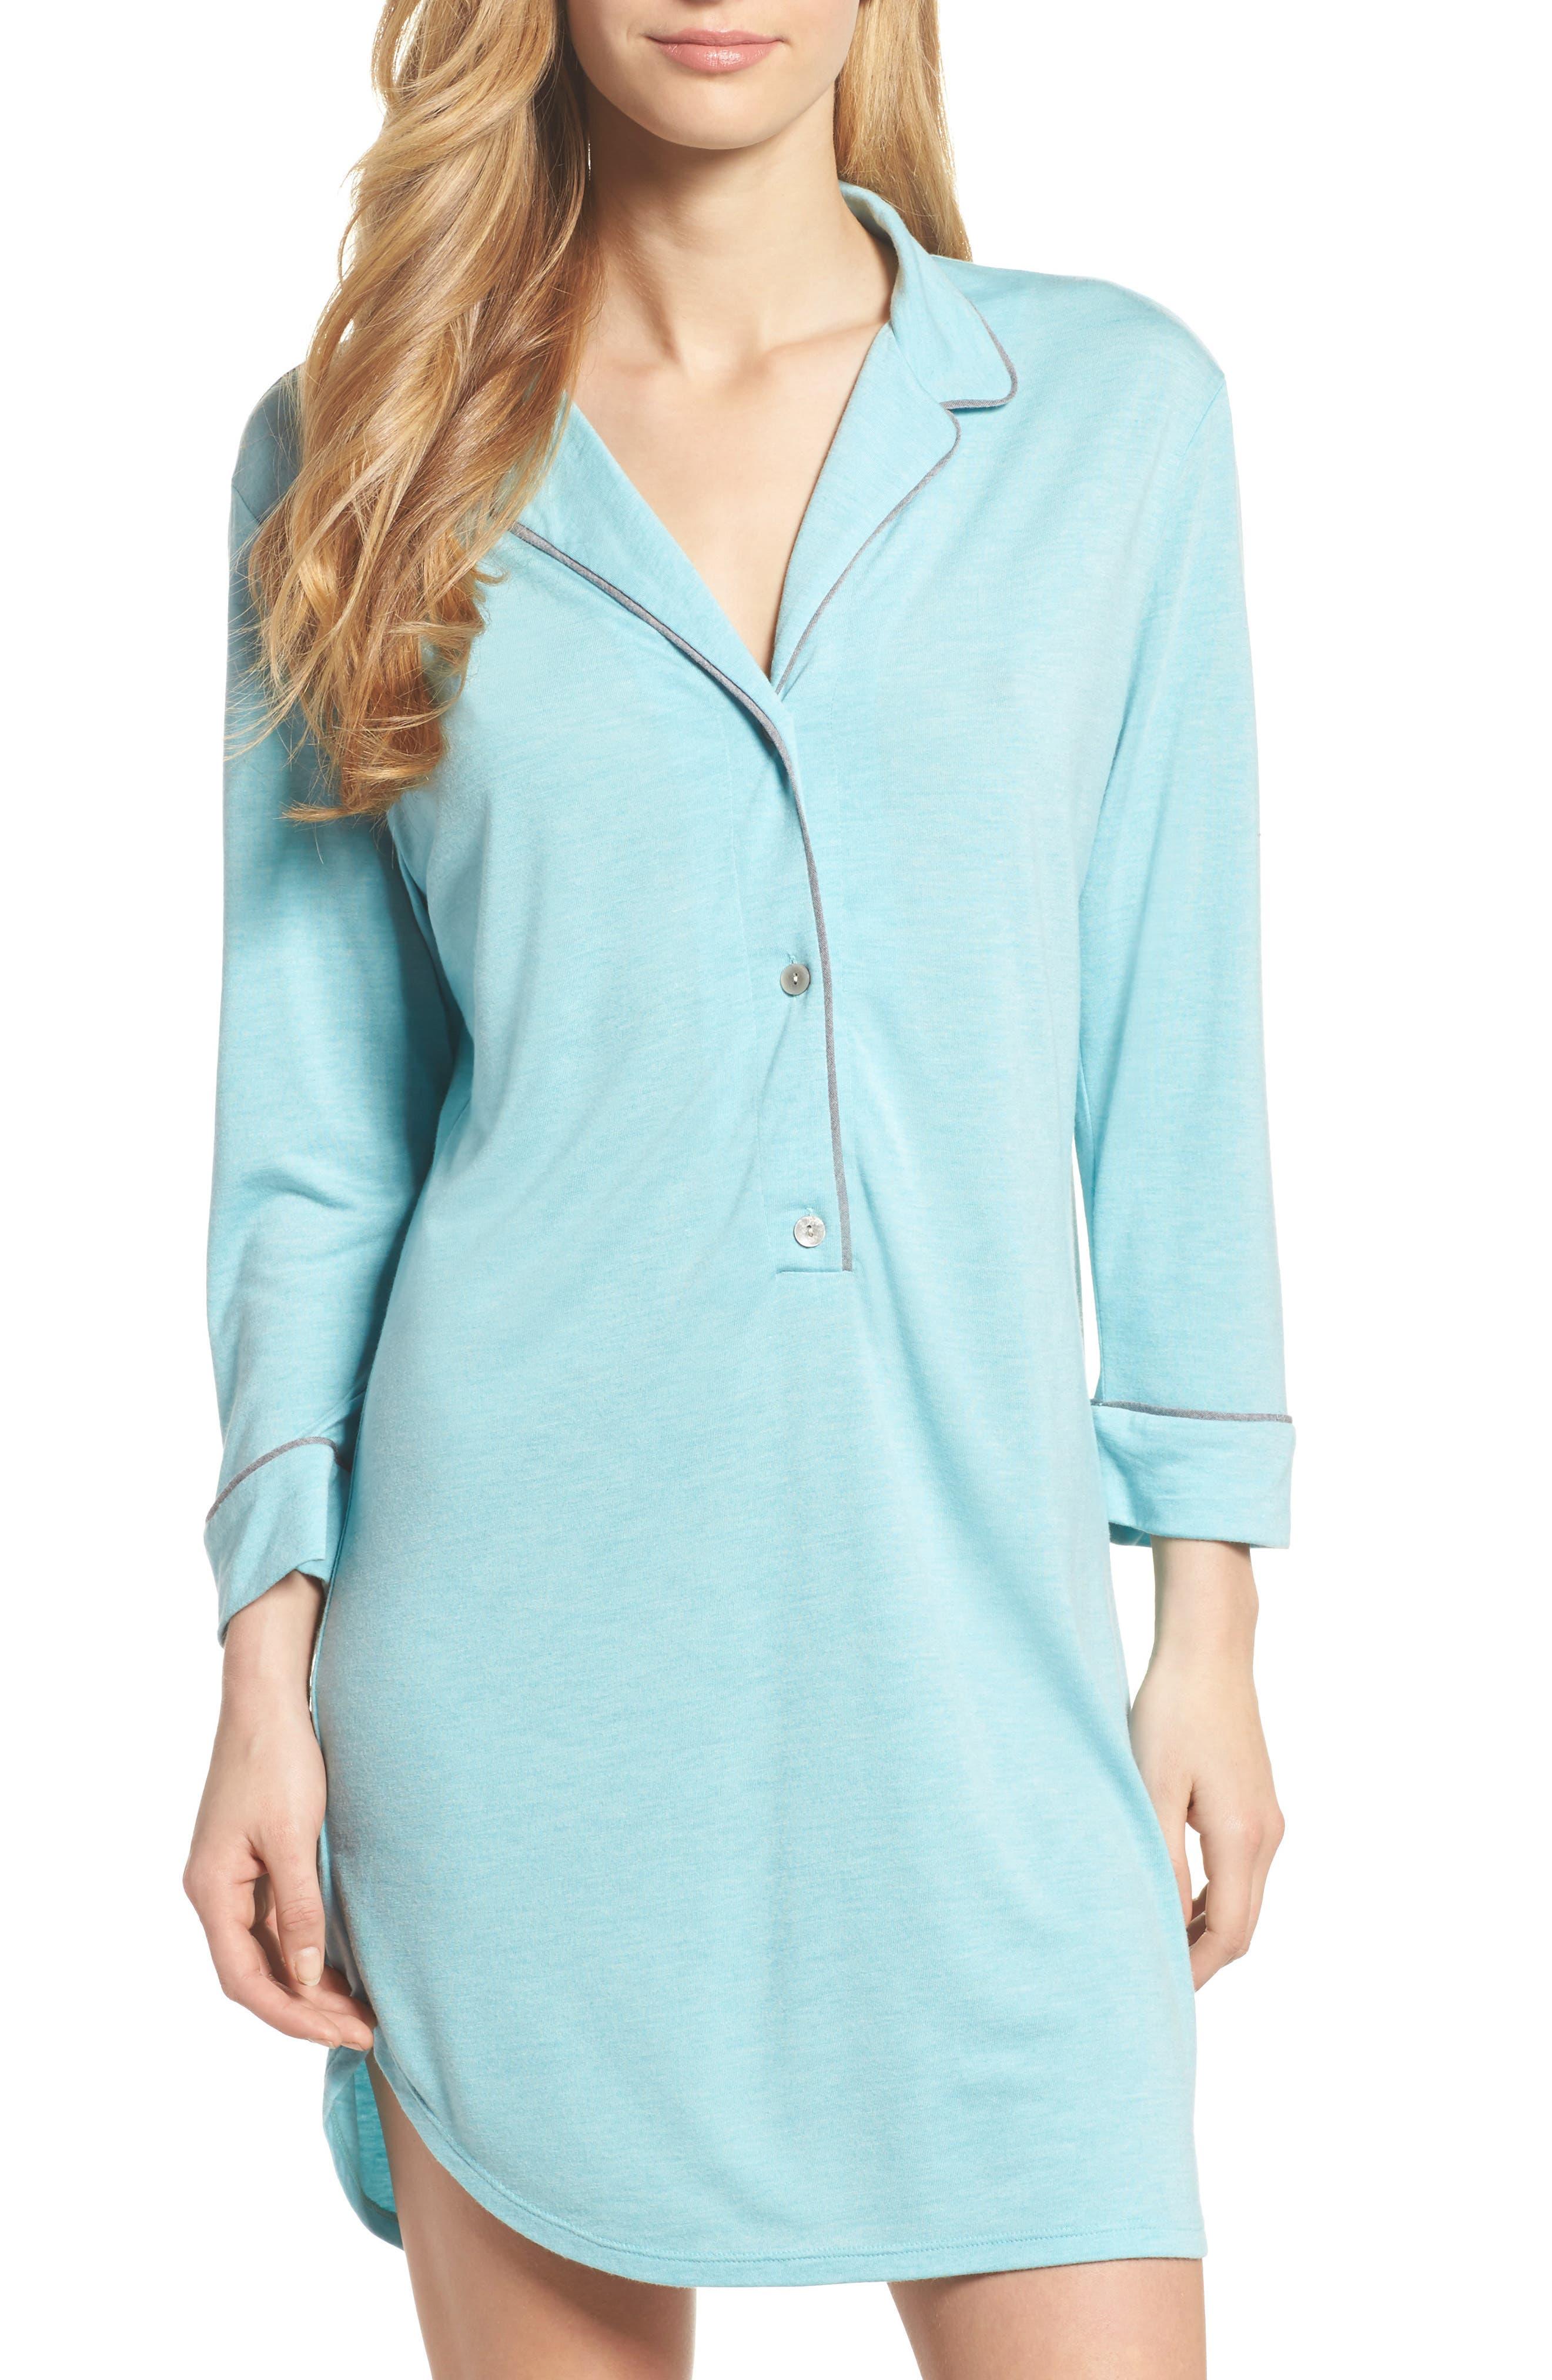 Shangri-La Sleep Shirt,                         Main,                         color, Turquoise